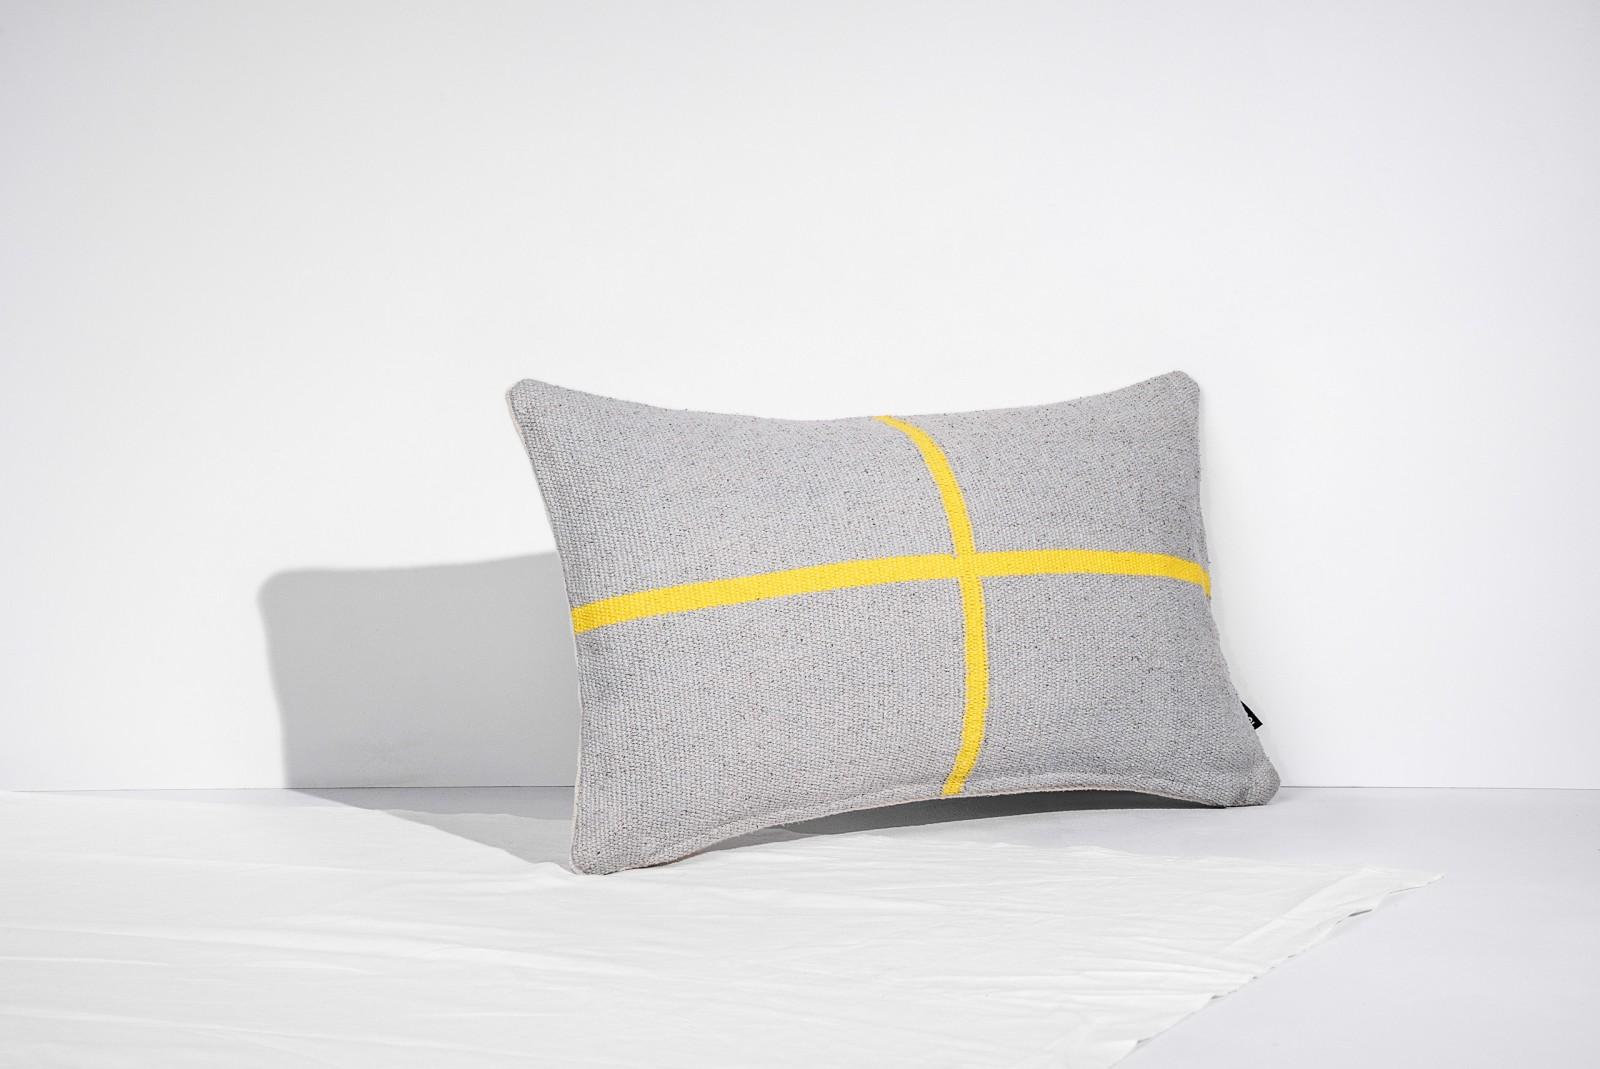 Jama-Khan Cushion Jamakhan Cross, Grey & Yellow, Rectangle